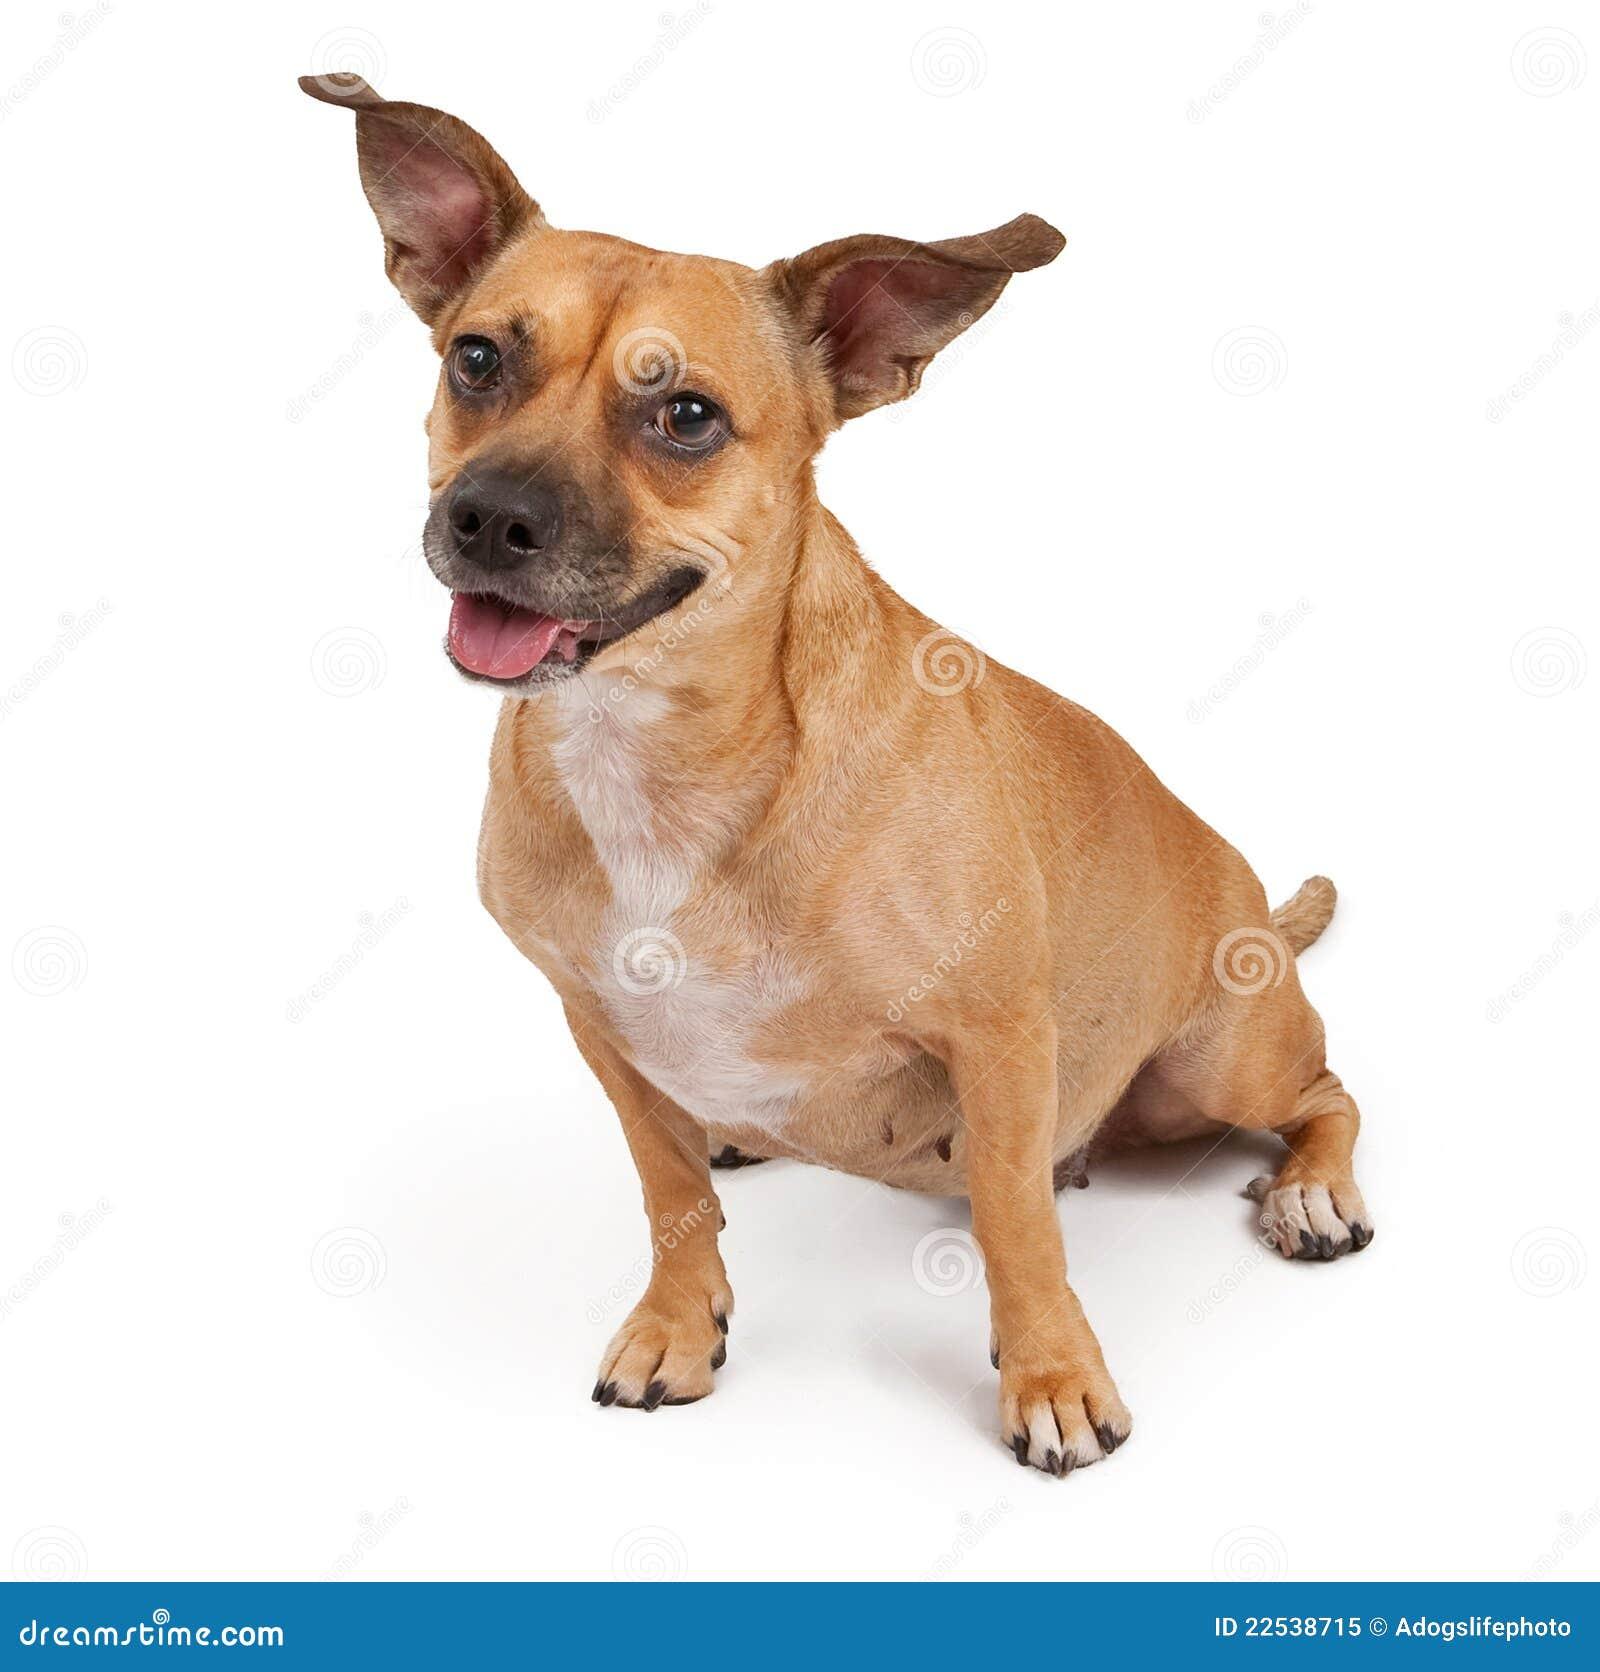 White Dog Perky Ears